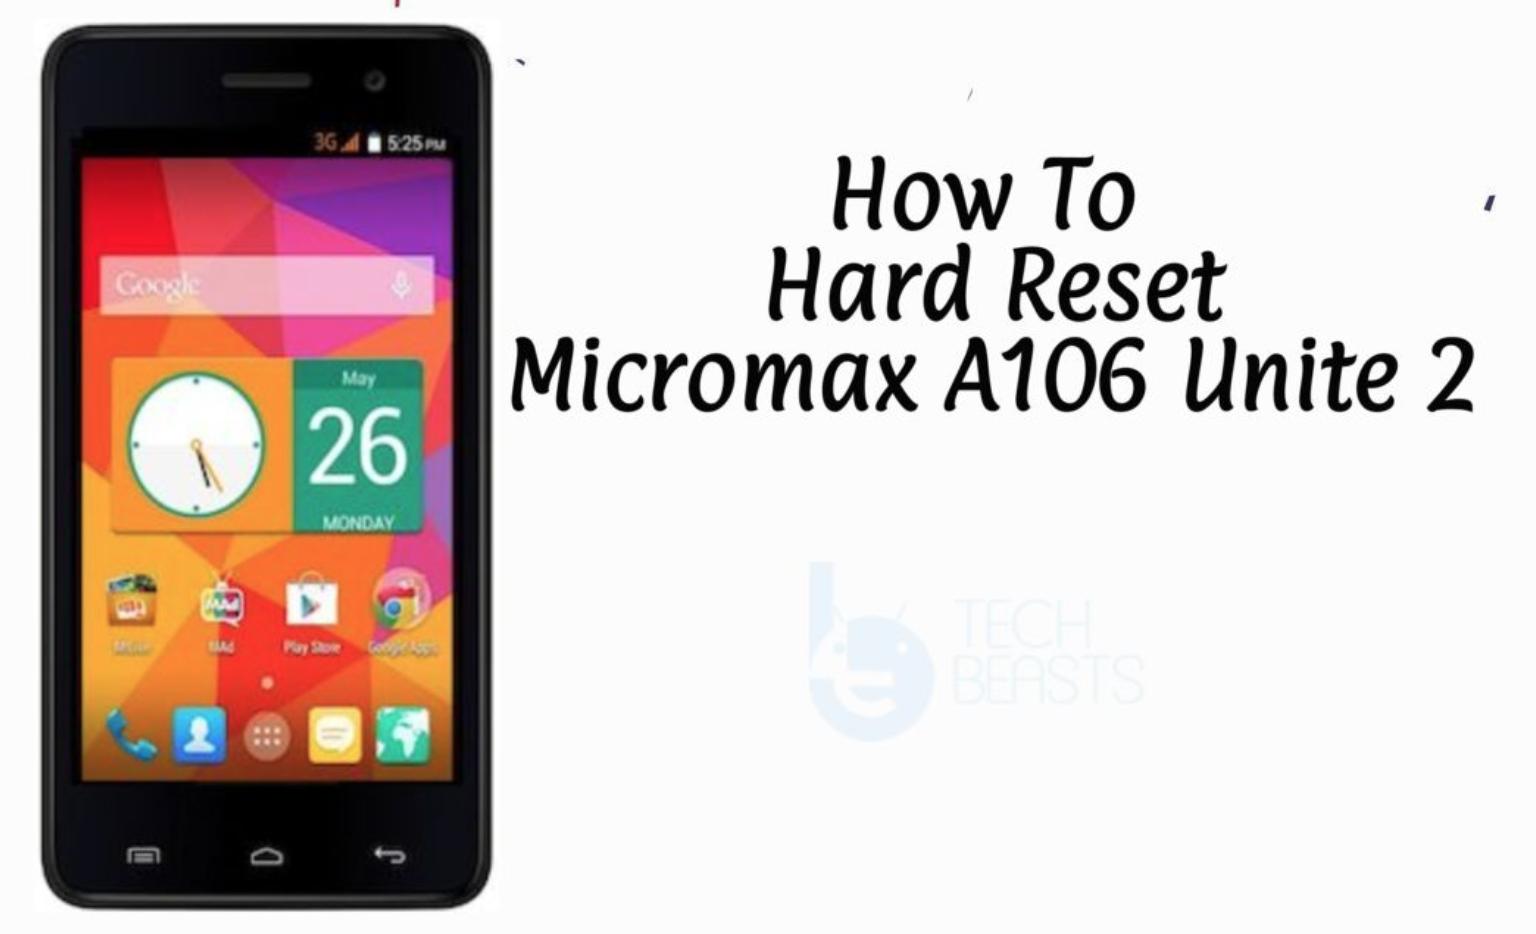 Hard Reset Micromax A106 Unite 2